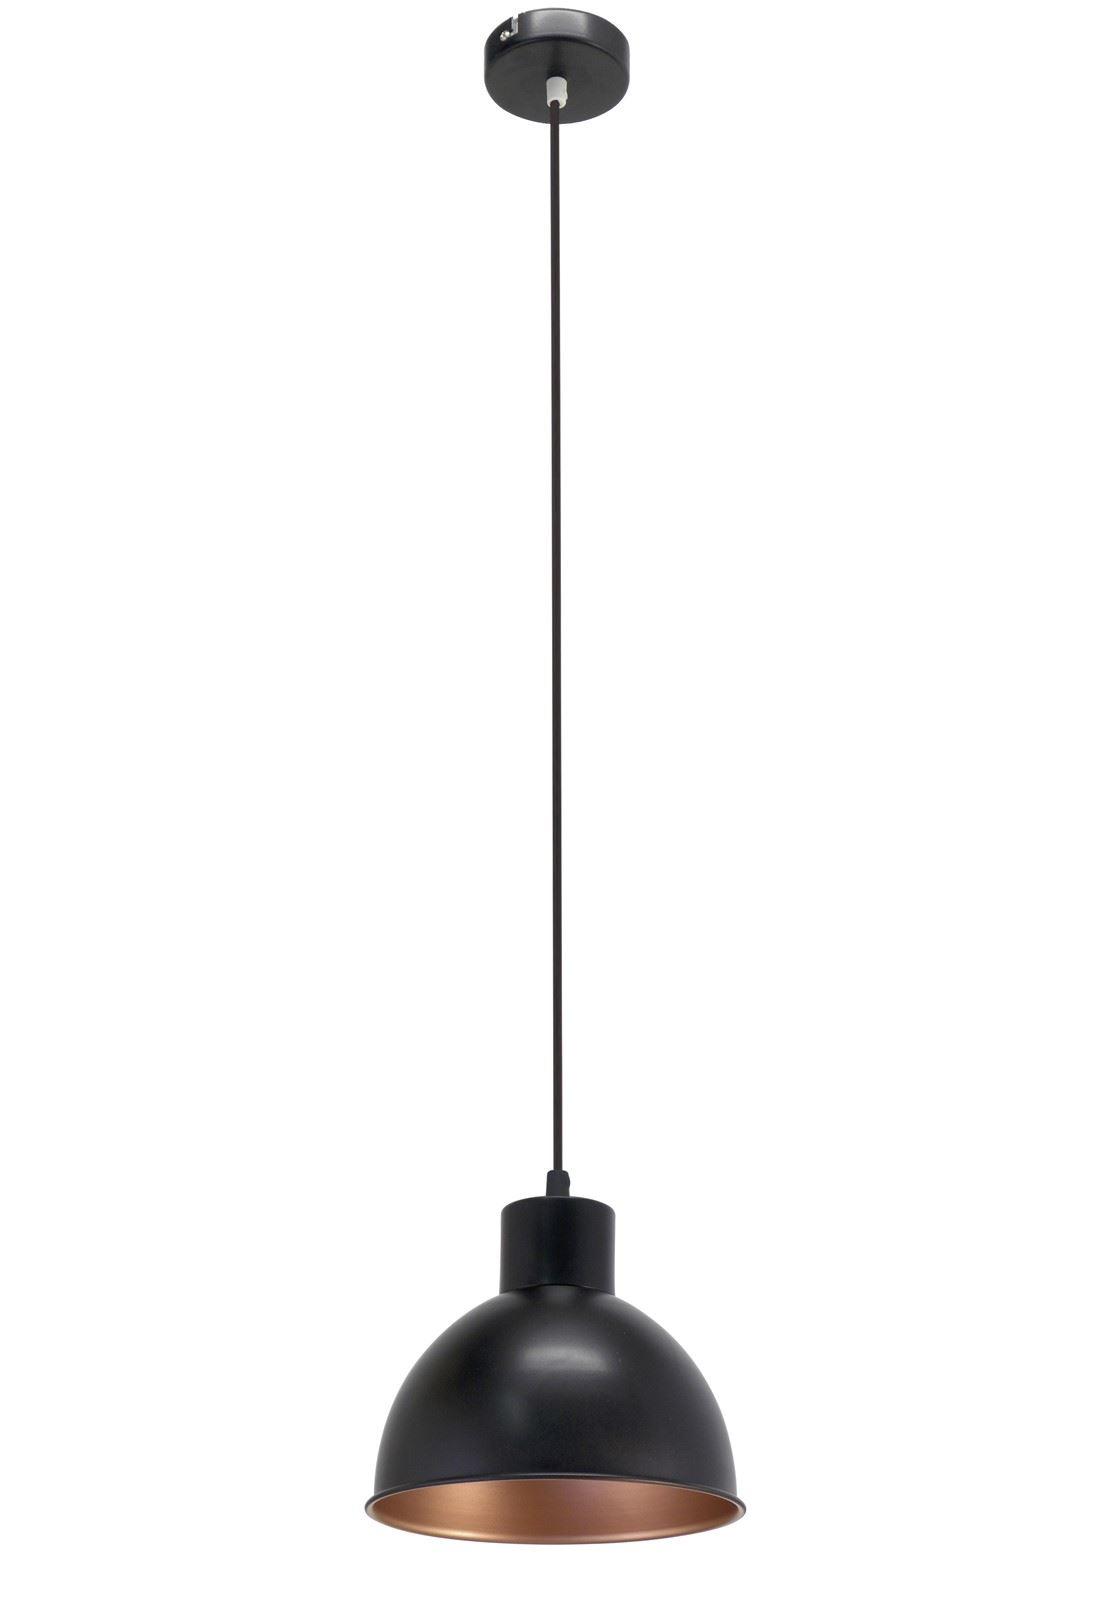 Truro Hanging Pendant Light E27 Steel Black Copper 210 mm Ø